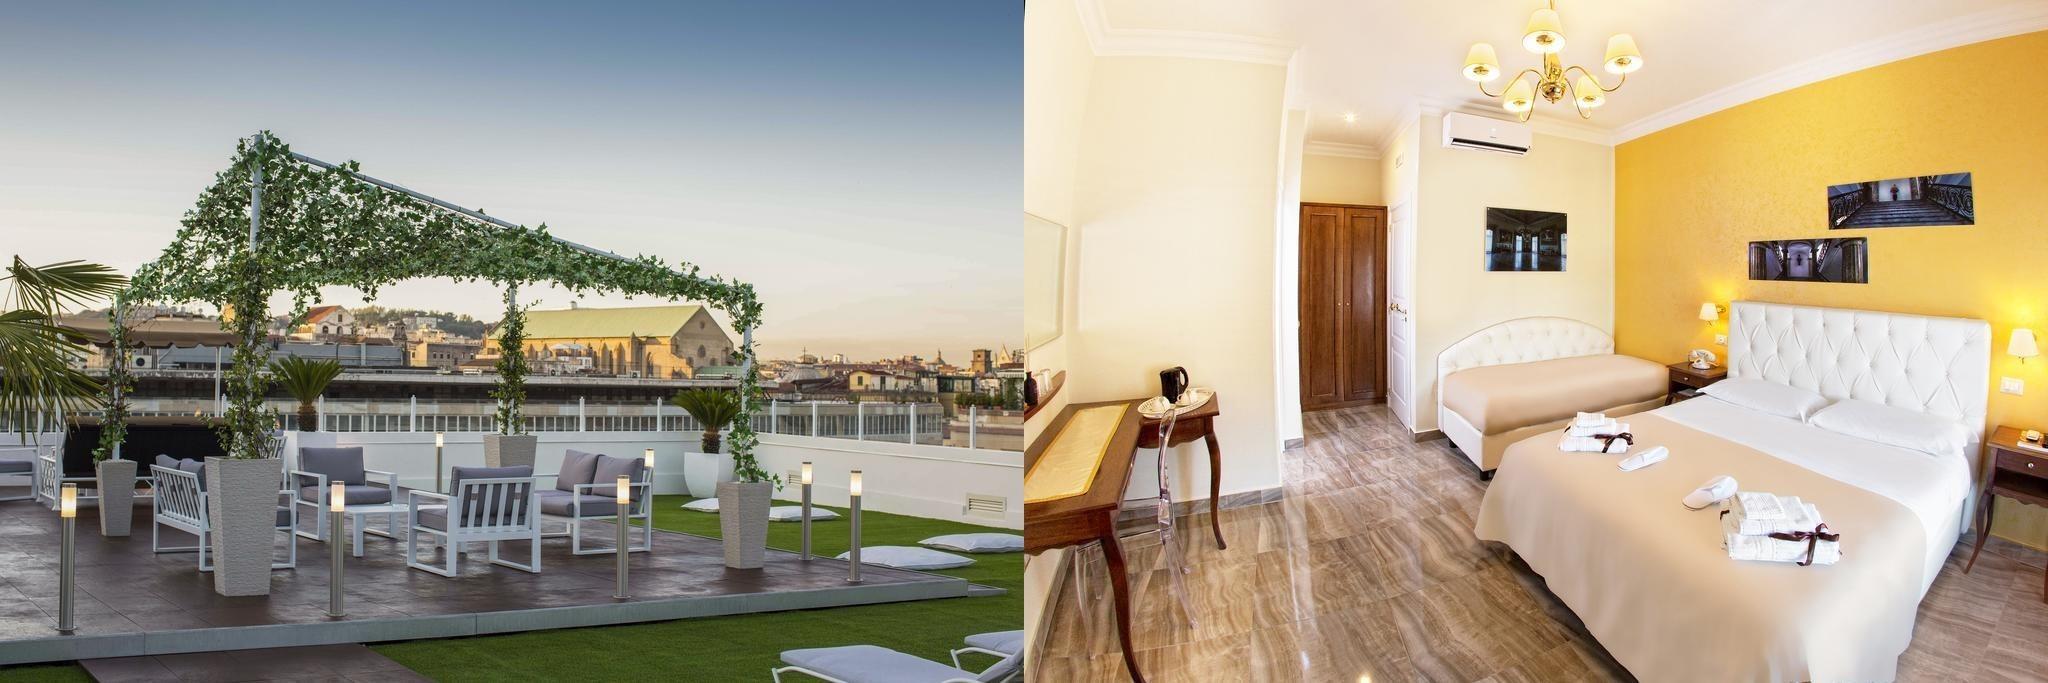 NeapolitanTrips Hotel Royale